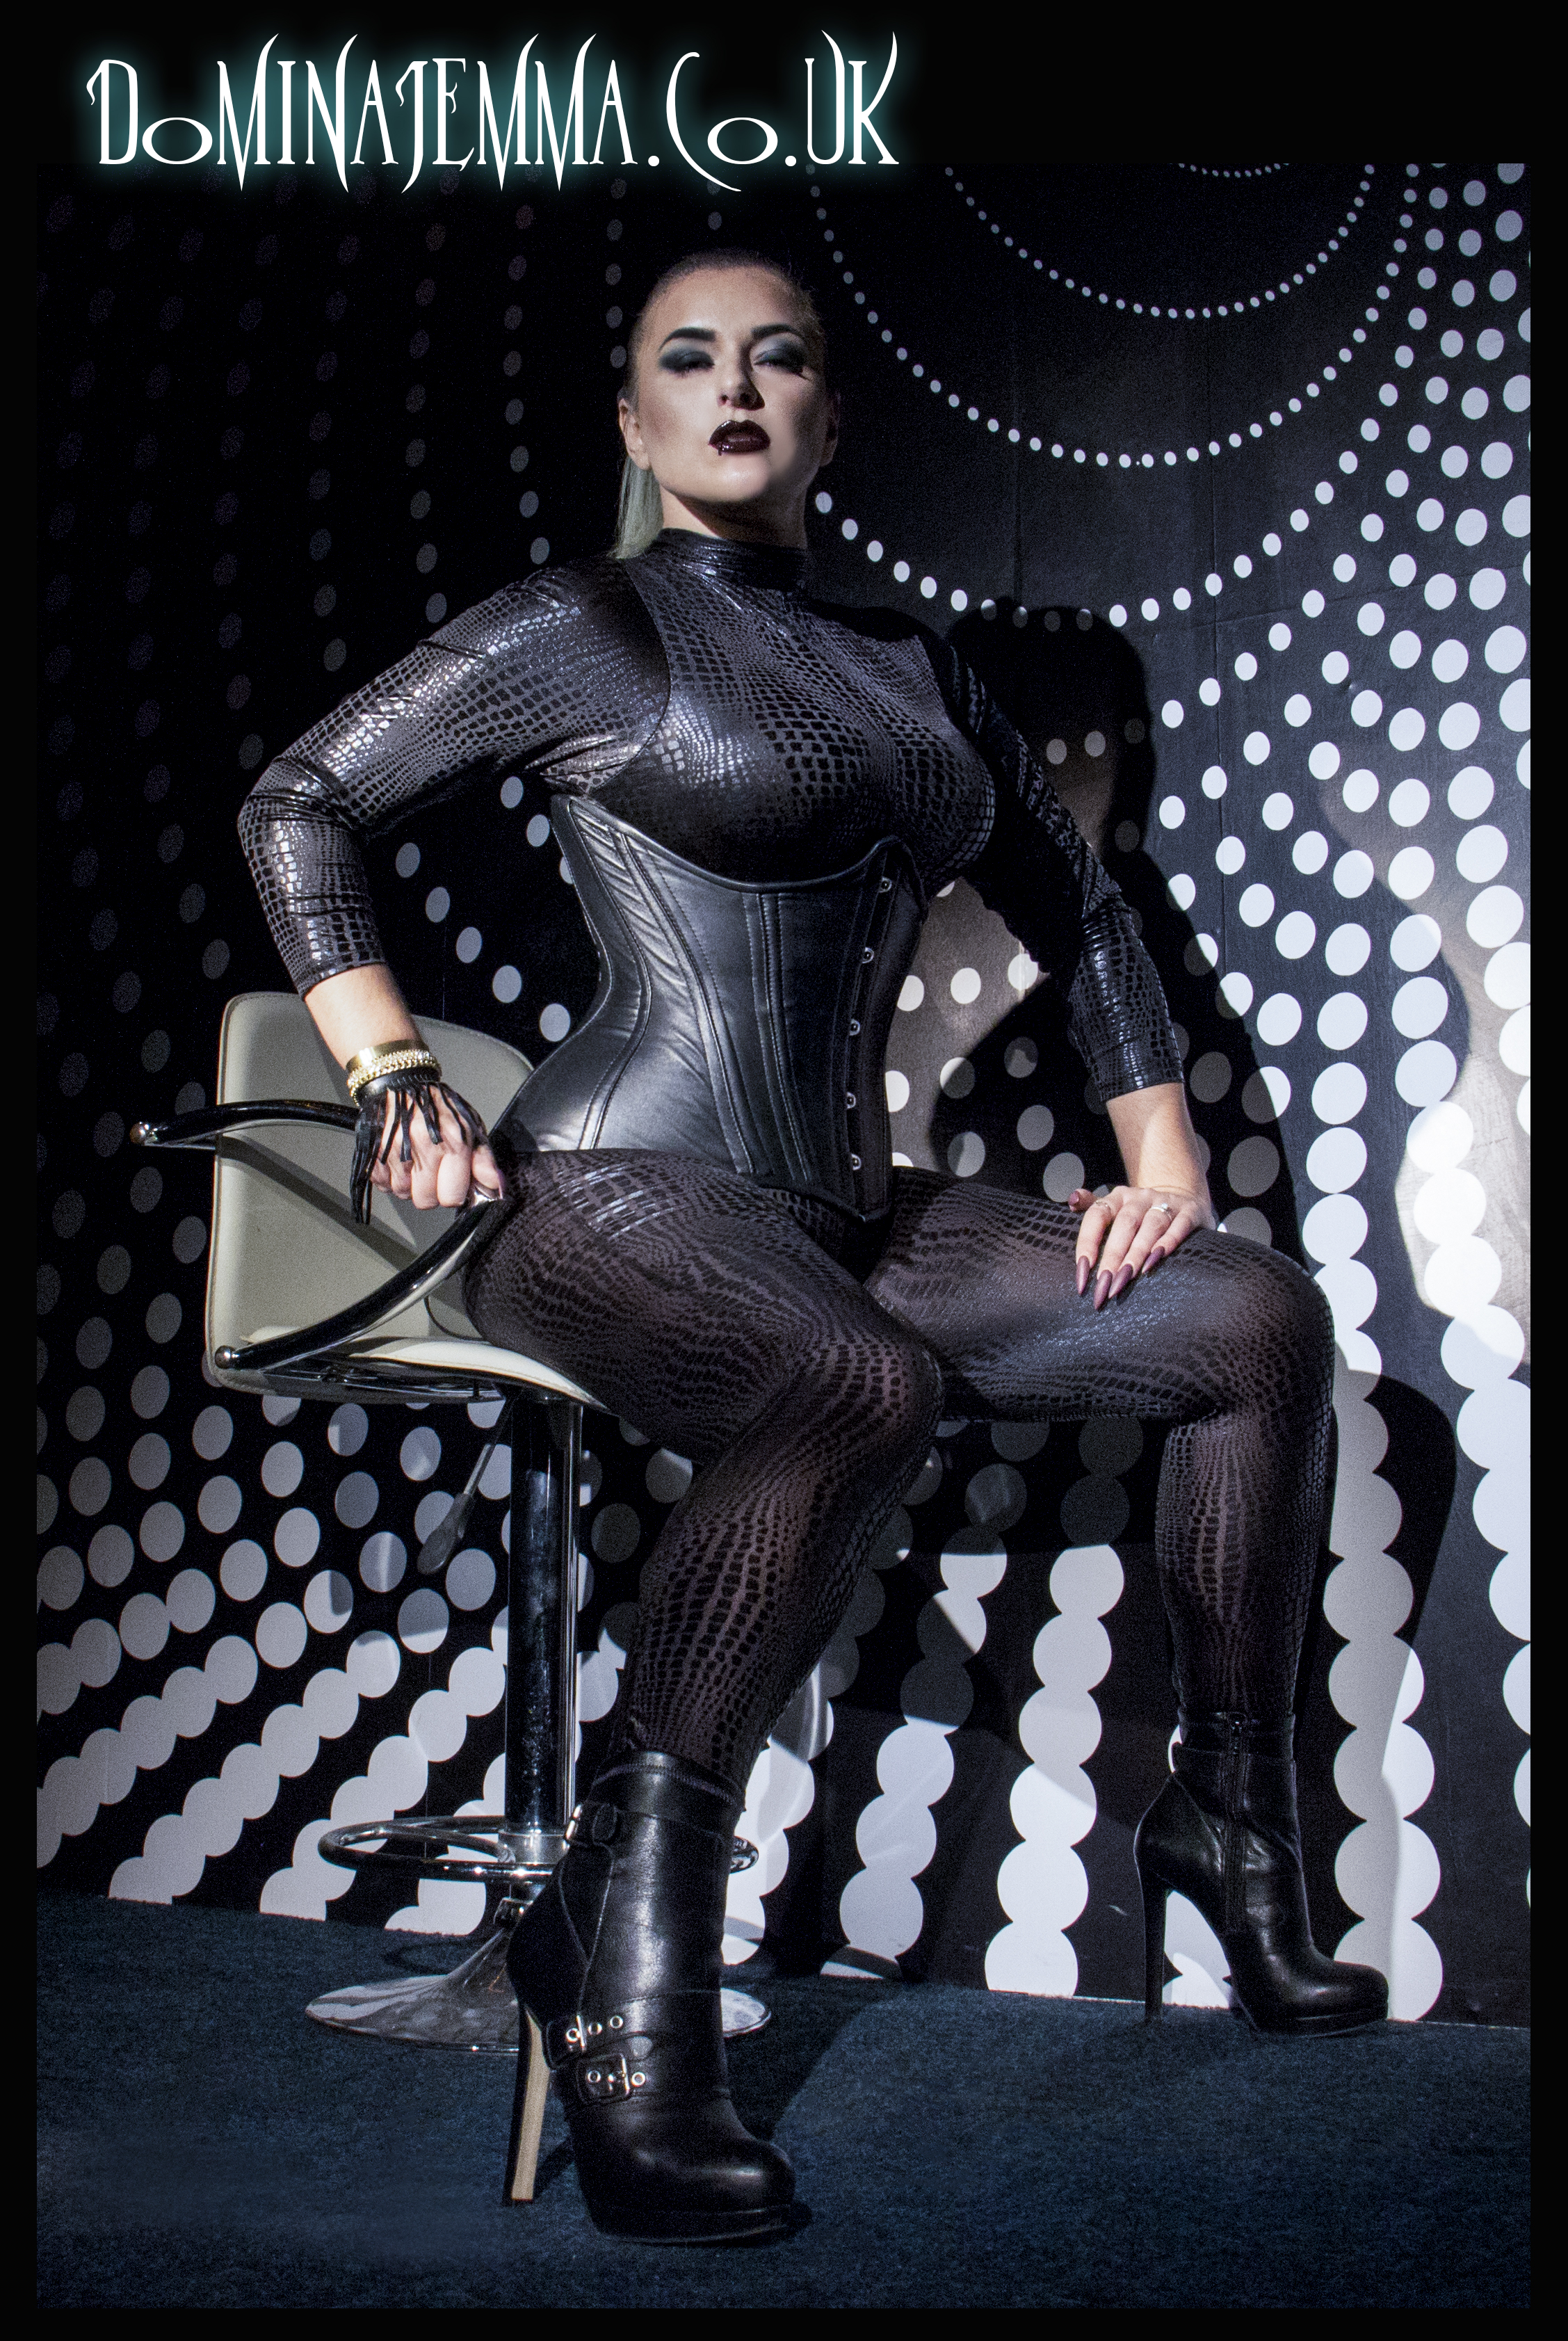 Domina Jemma - Mistress Dudley